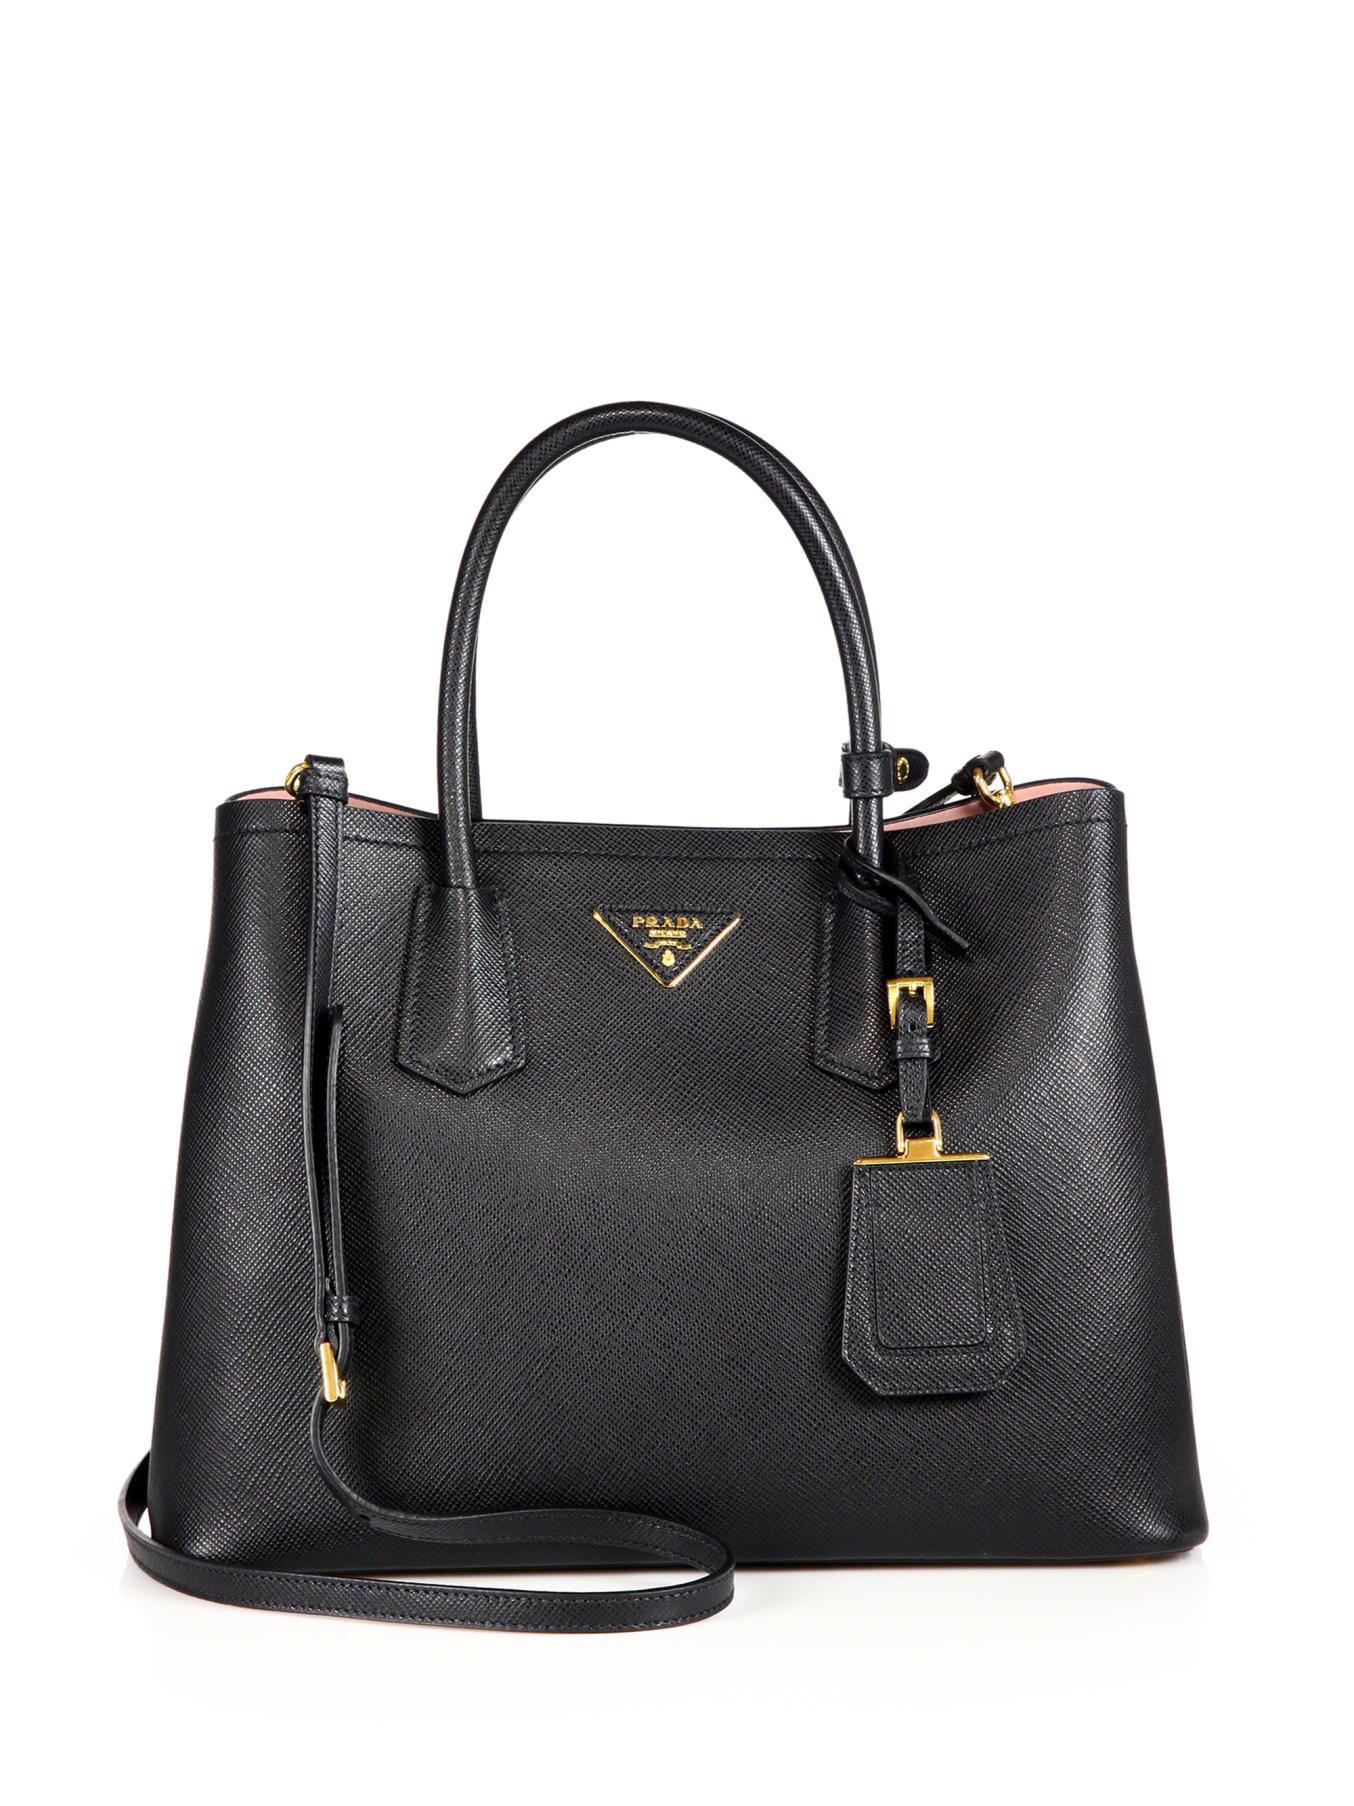 prada medium saffiano leather double bag in black black. Black Bedroom Furniture Sets. Home Design Ideas